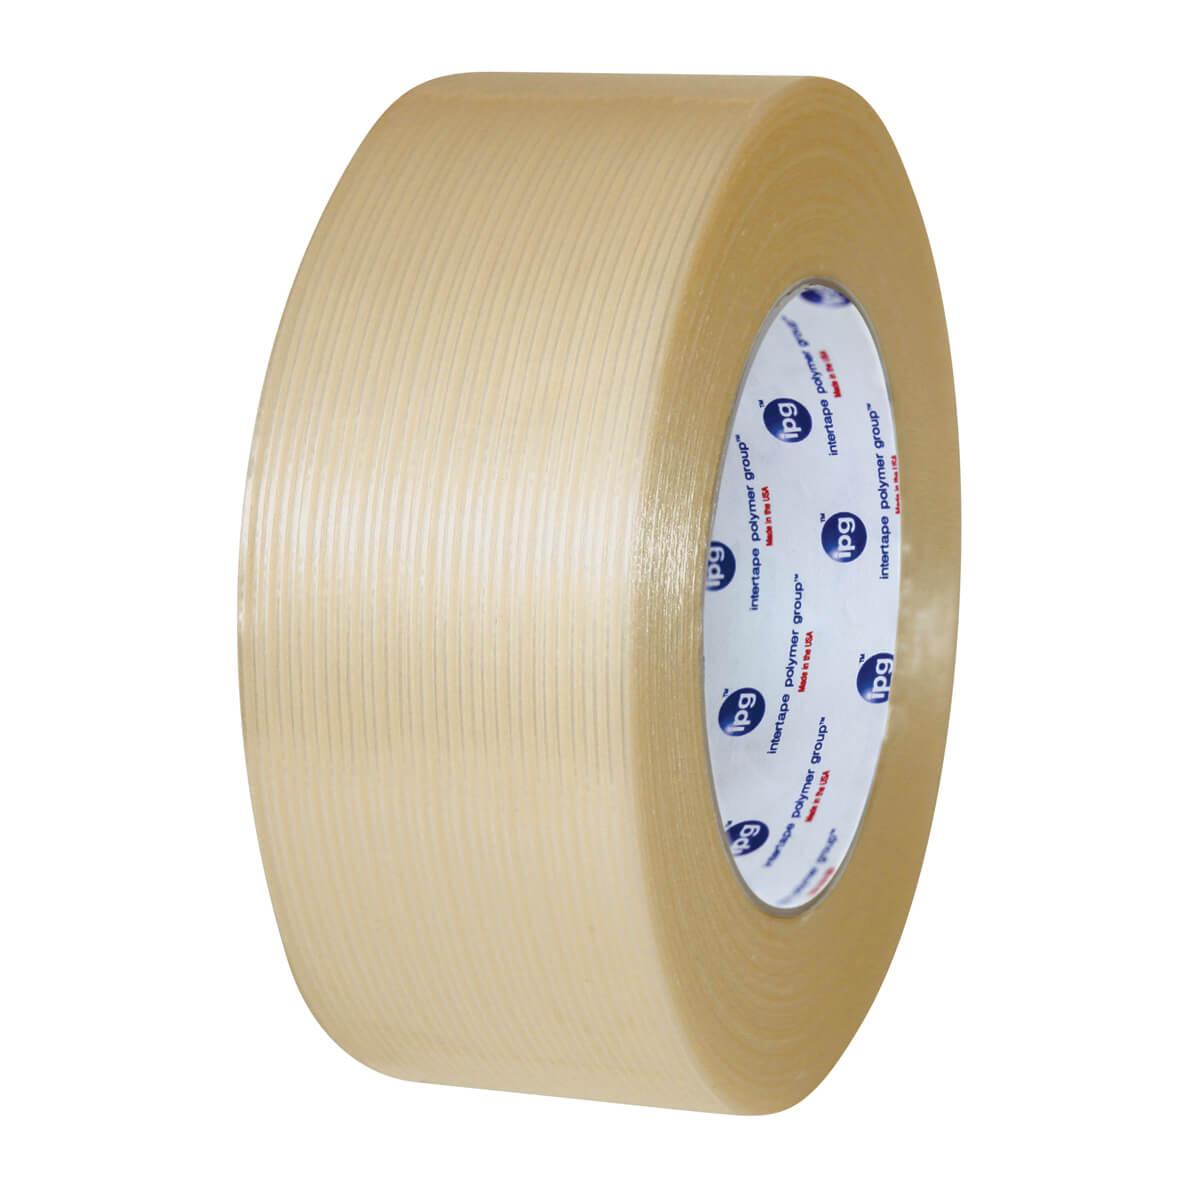 "Anti-Slip Safety Tape - Gator Grip® - 2"" x 60' - Blk (Previously TSW1500)"